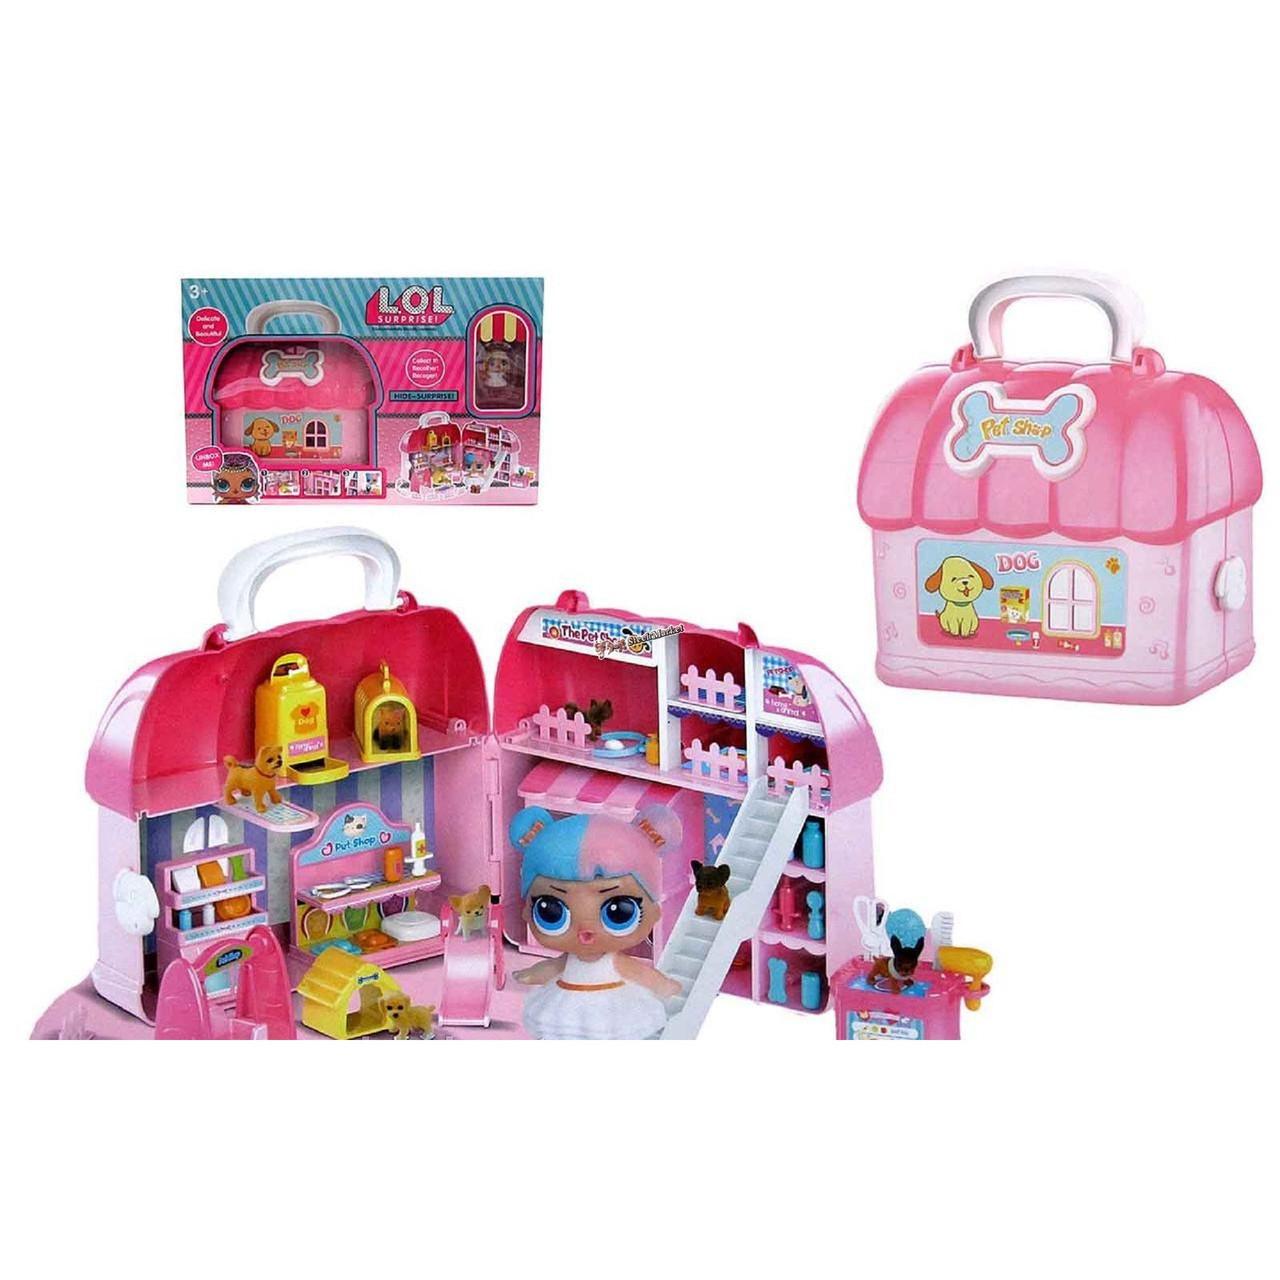 Кукла LOL с мебелью QL 045-1